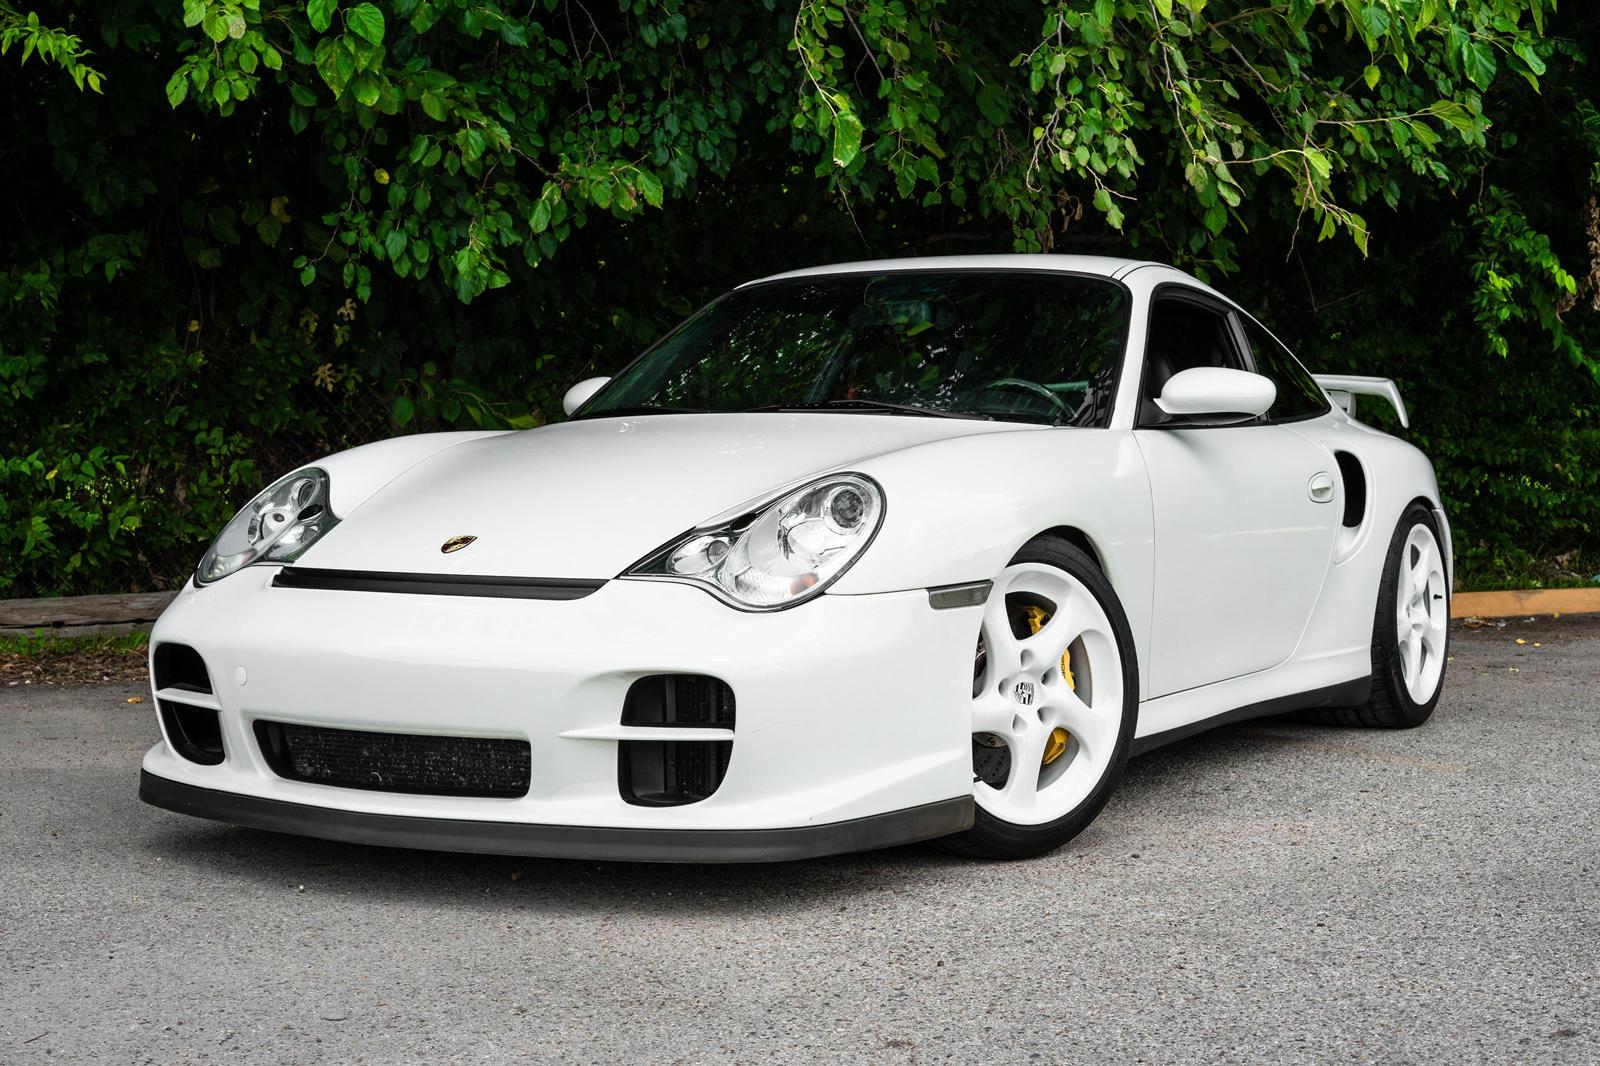 photo of Carrara White Porsche 911 GT2 Is 1 Of 10 Ever Made image